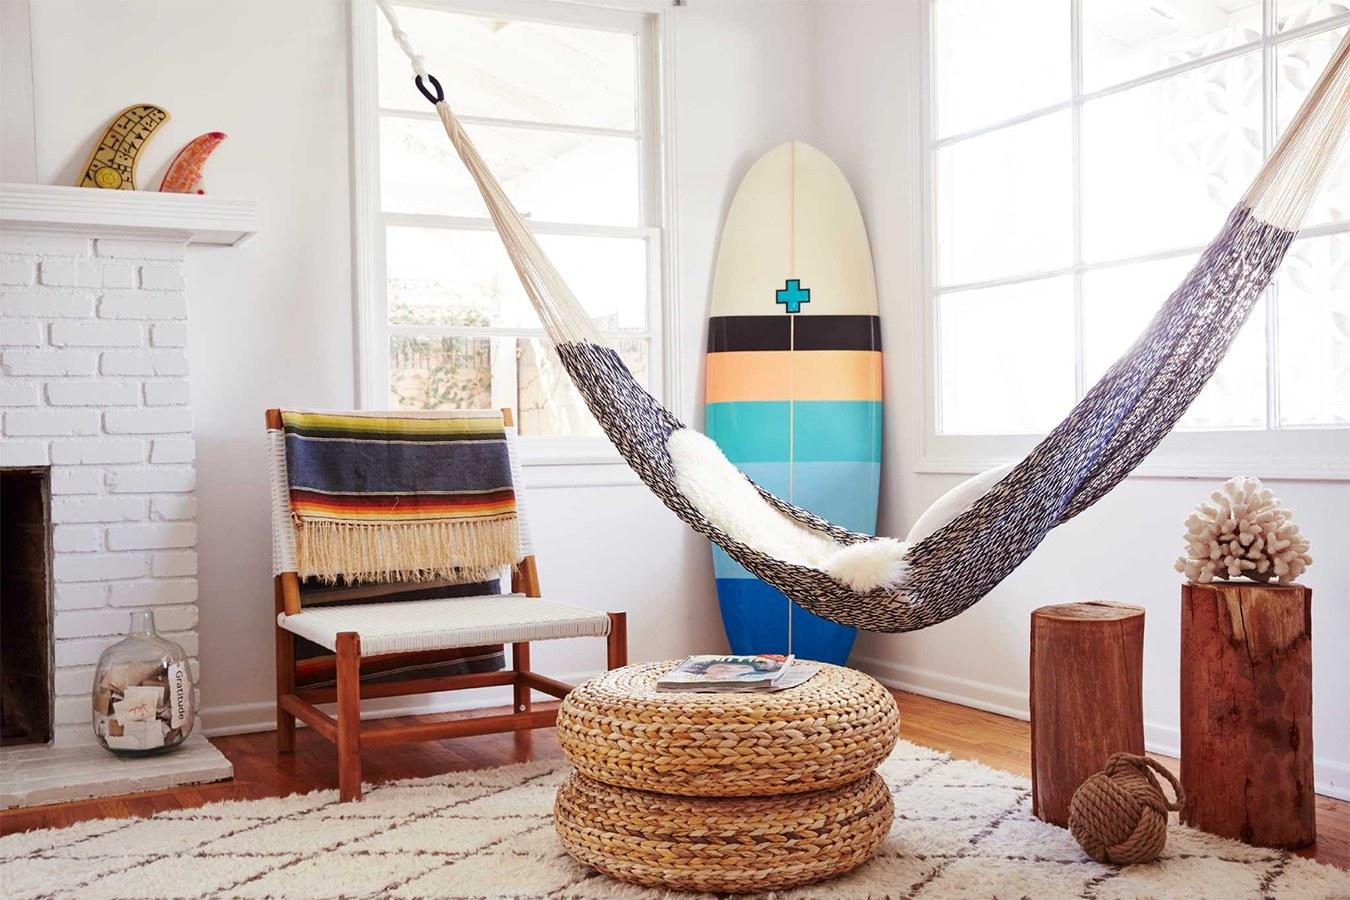 DIY Hammock: Instruction on How to Make your Home Comfortable. Modern bachelor's den